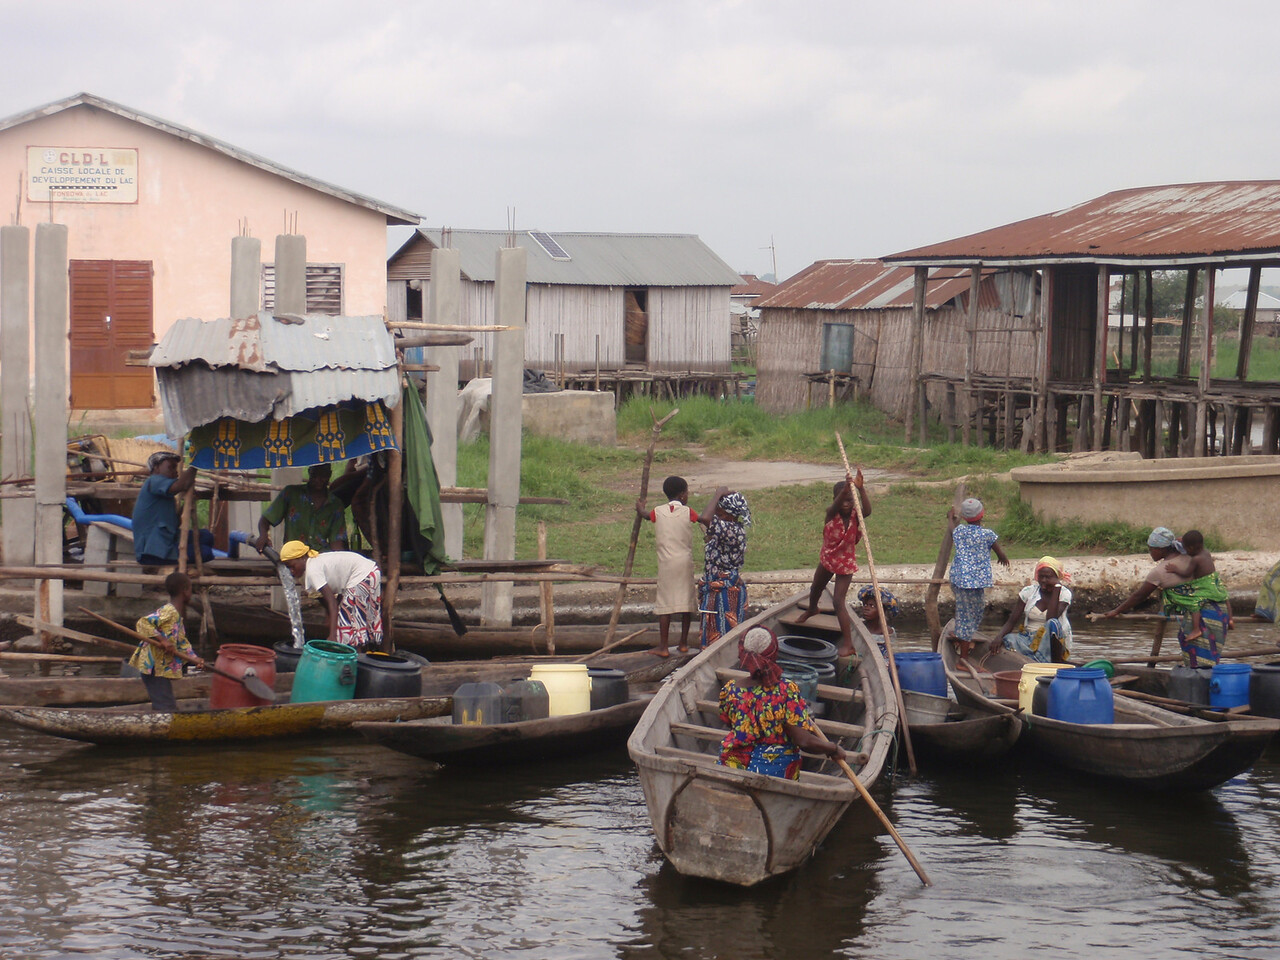 114_Ganvie Lake Community  Lake Nokoue  Small Floating Markets